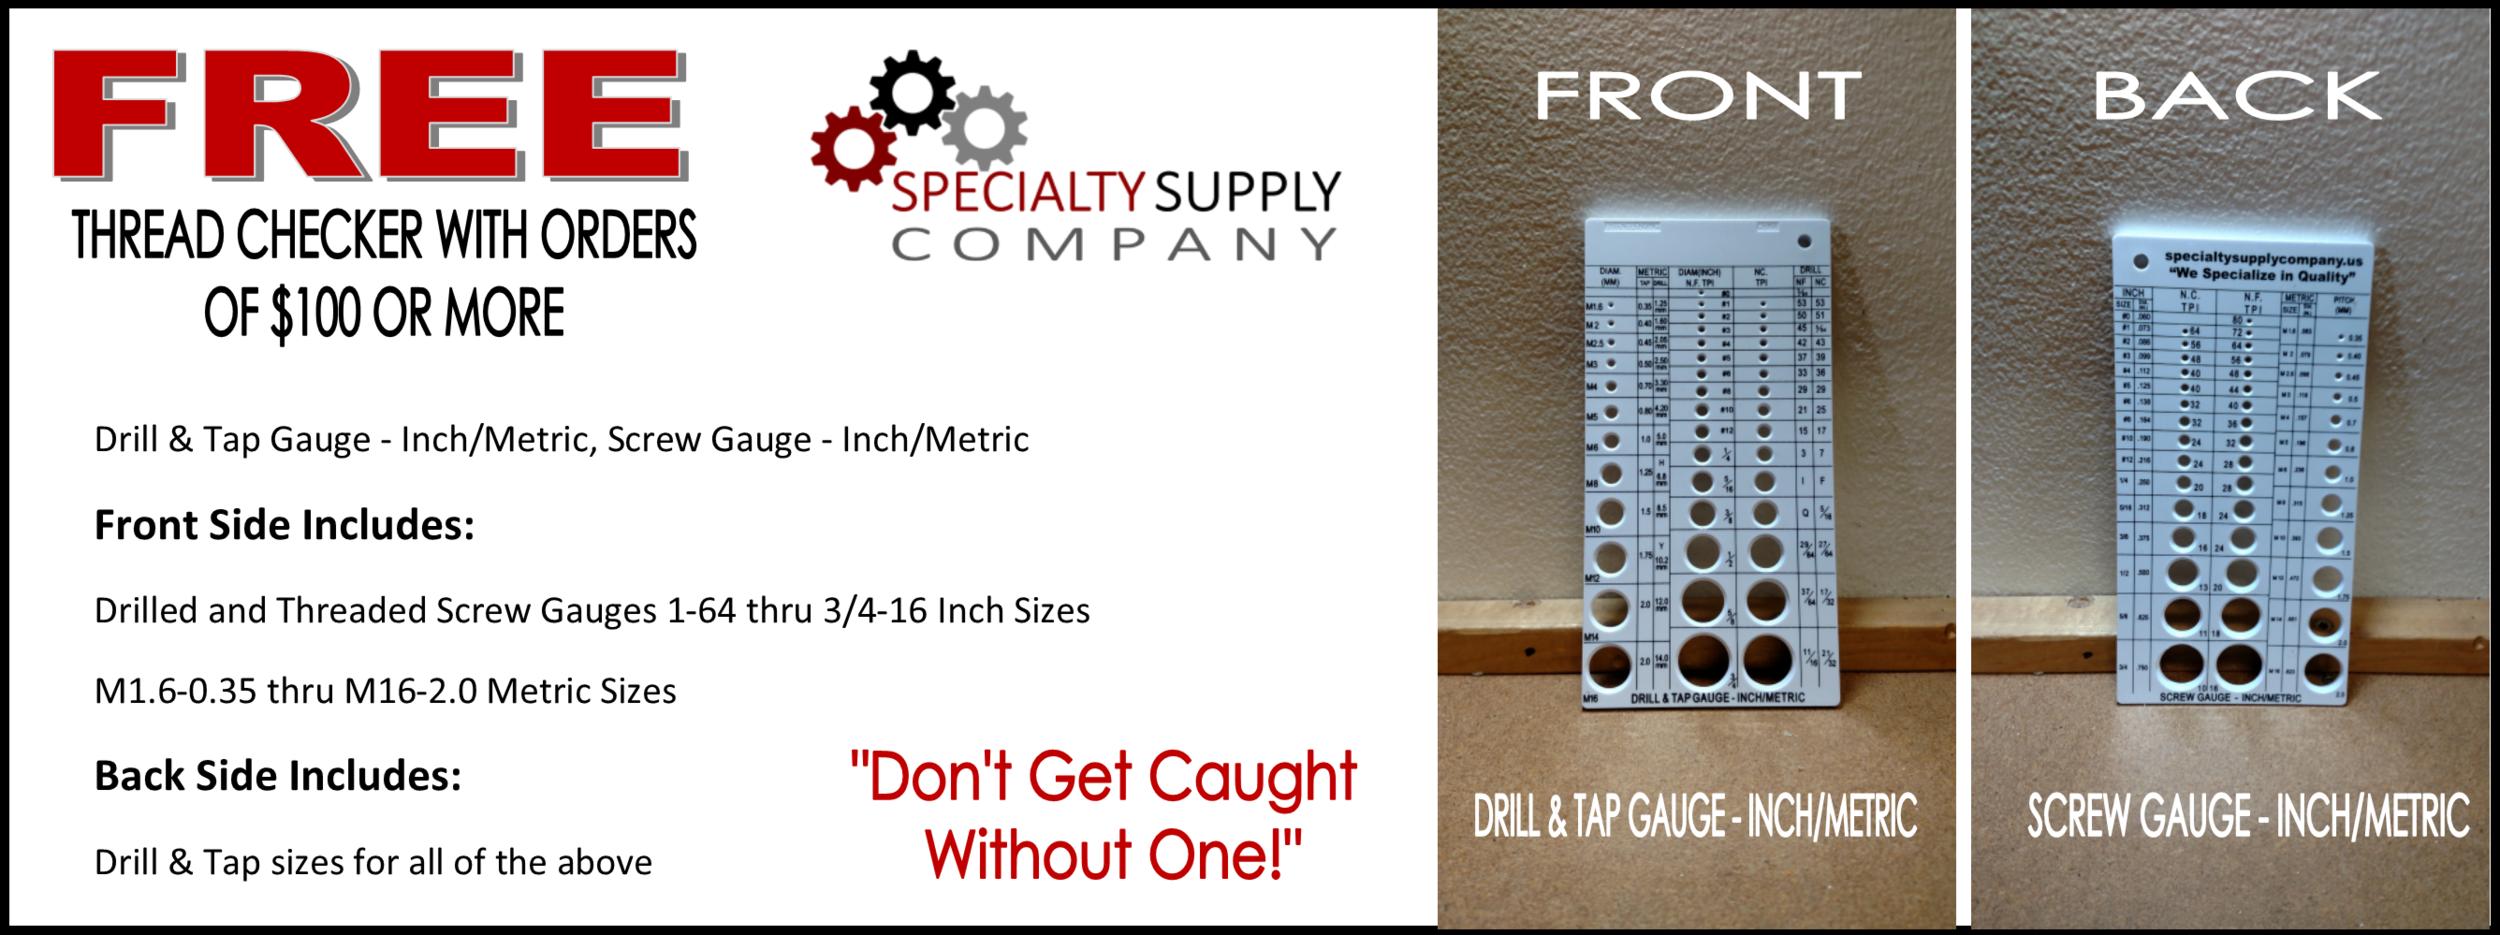 thread-checker-drills-taps-metric